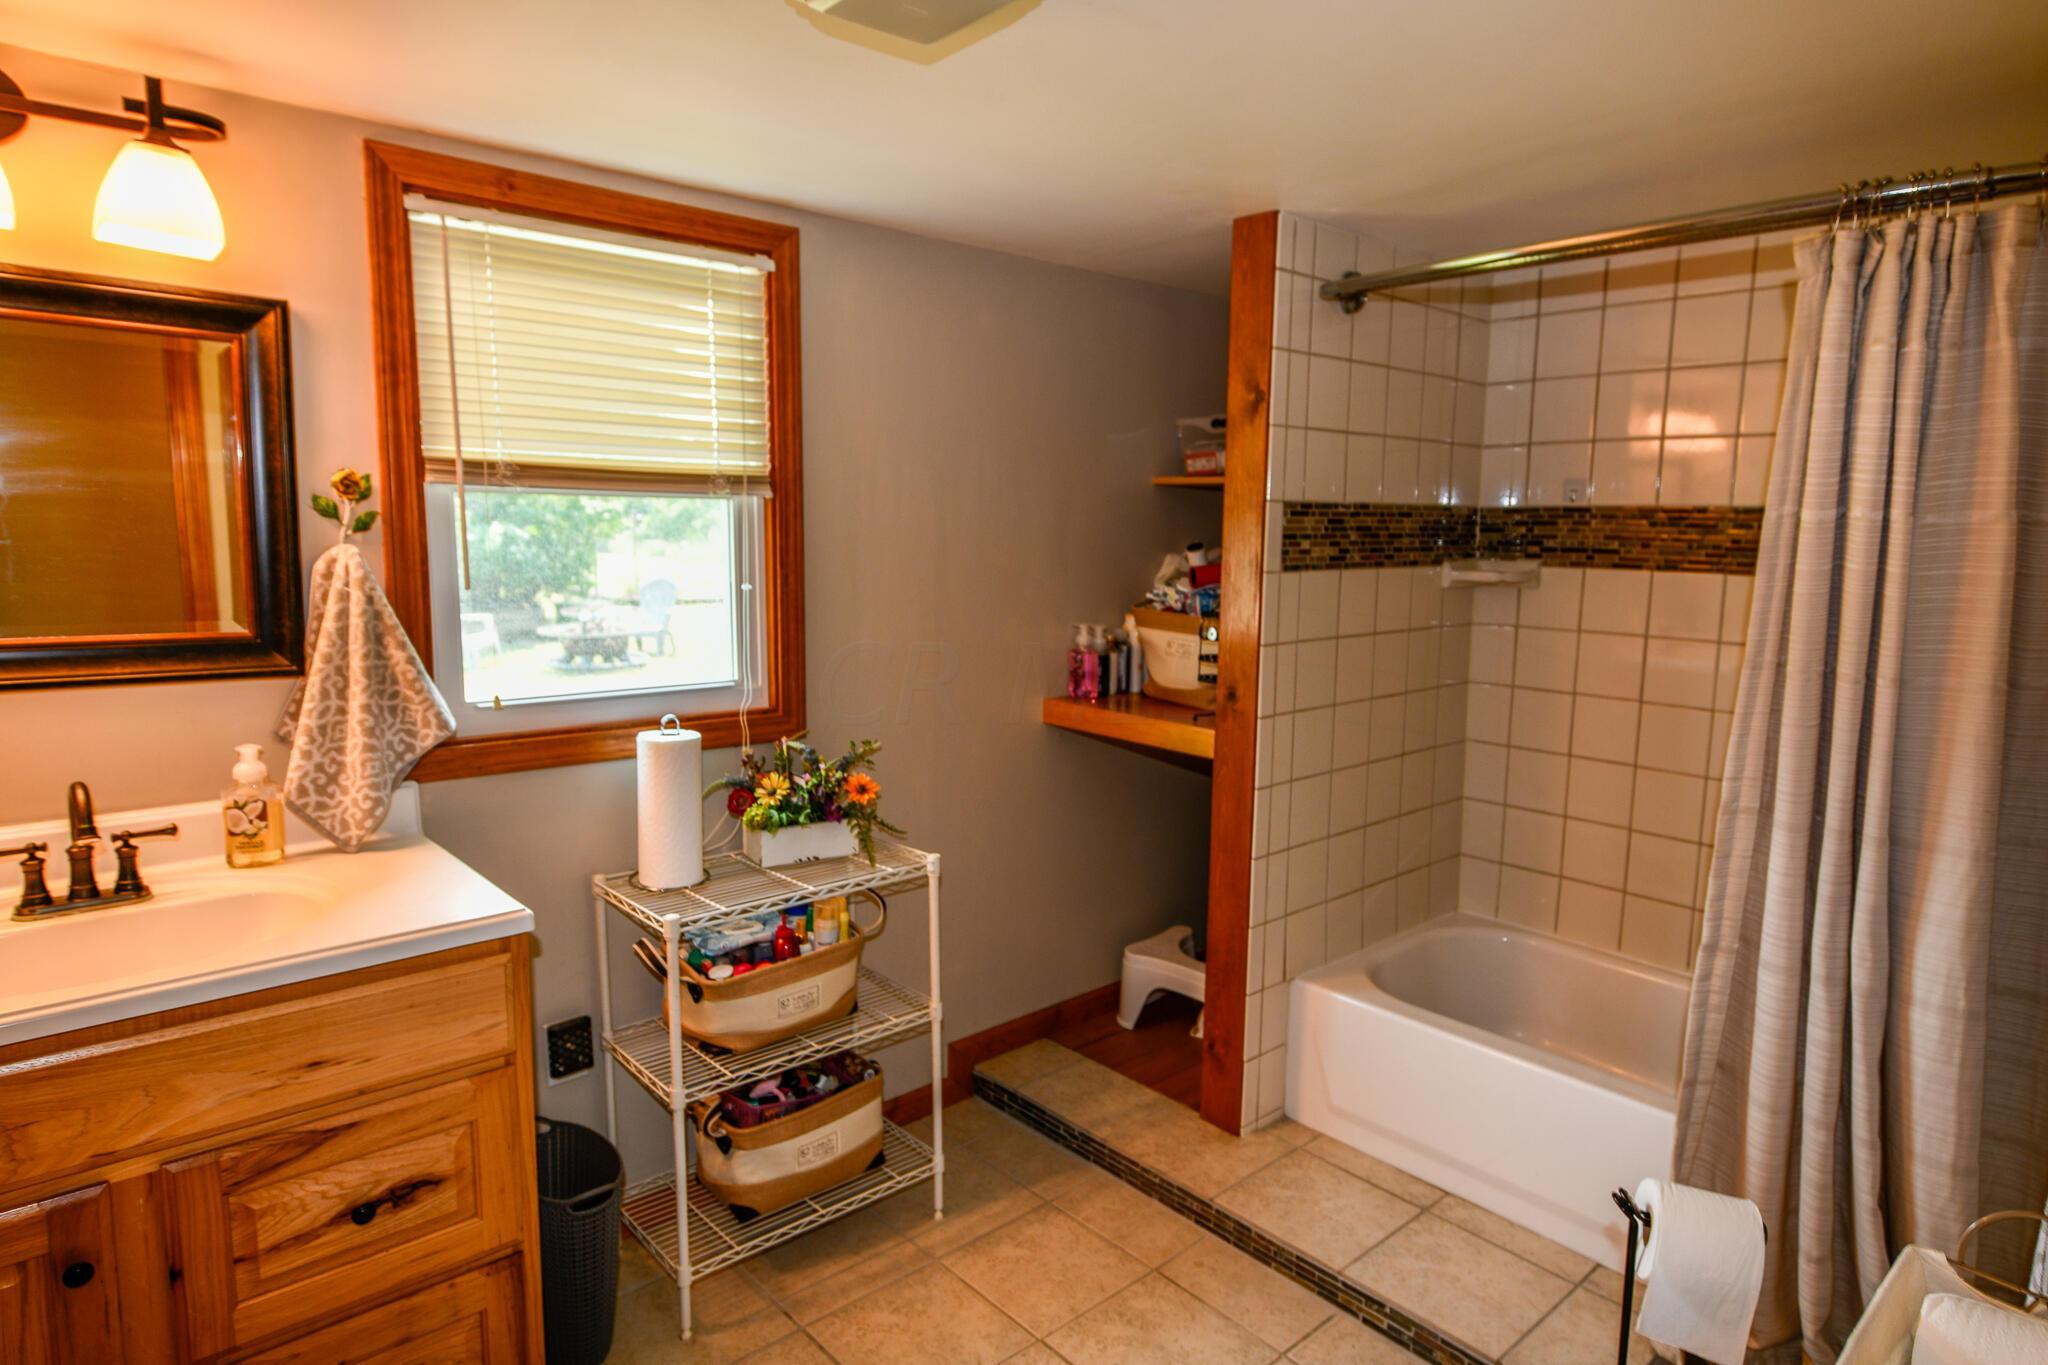 Full Bath: 7'x11' w/3' Deep Alcove